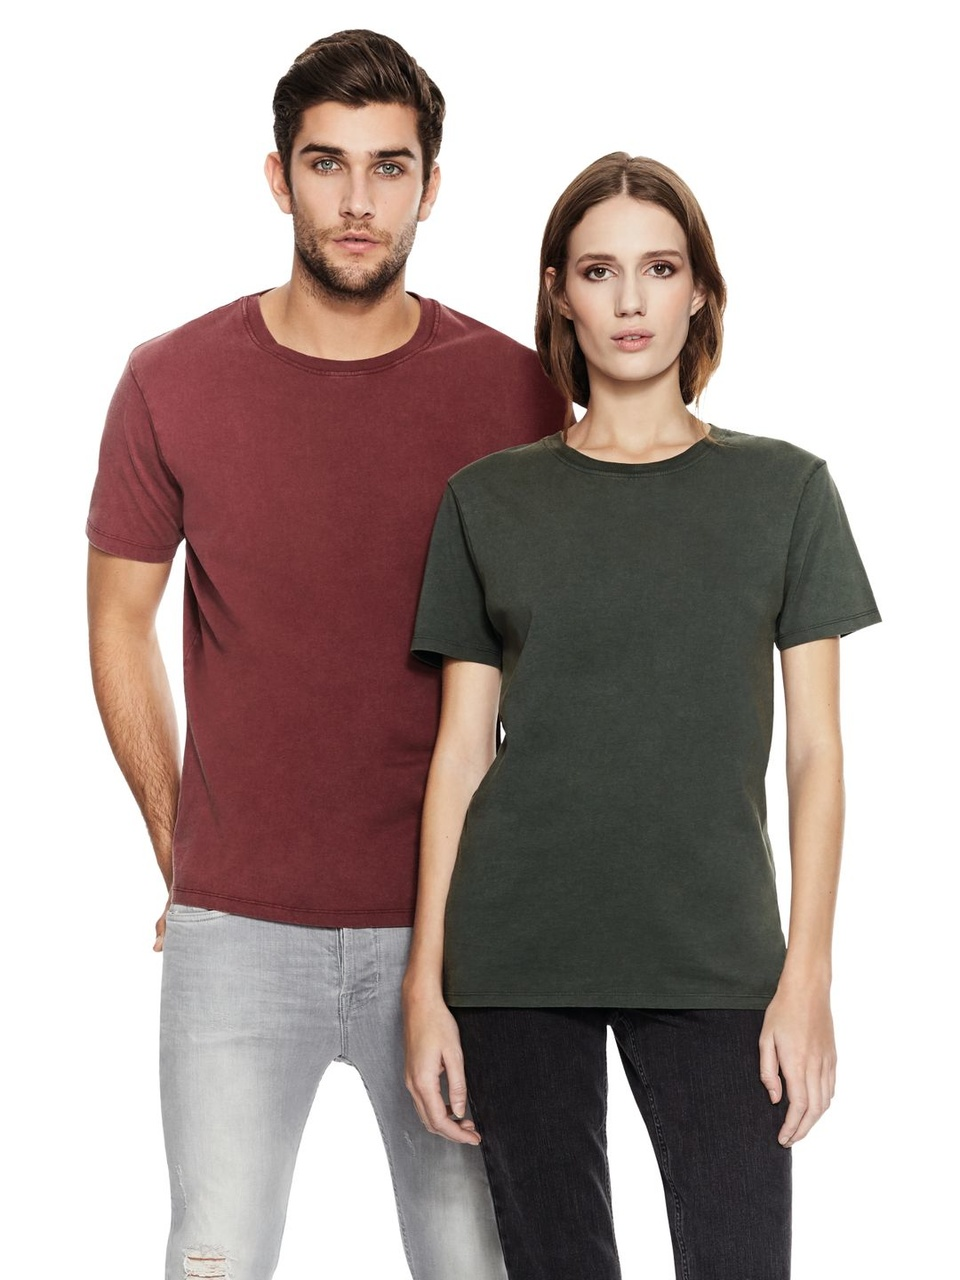 Unisex Organic Style T-Shirt